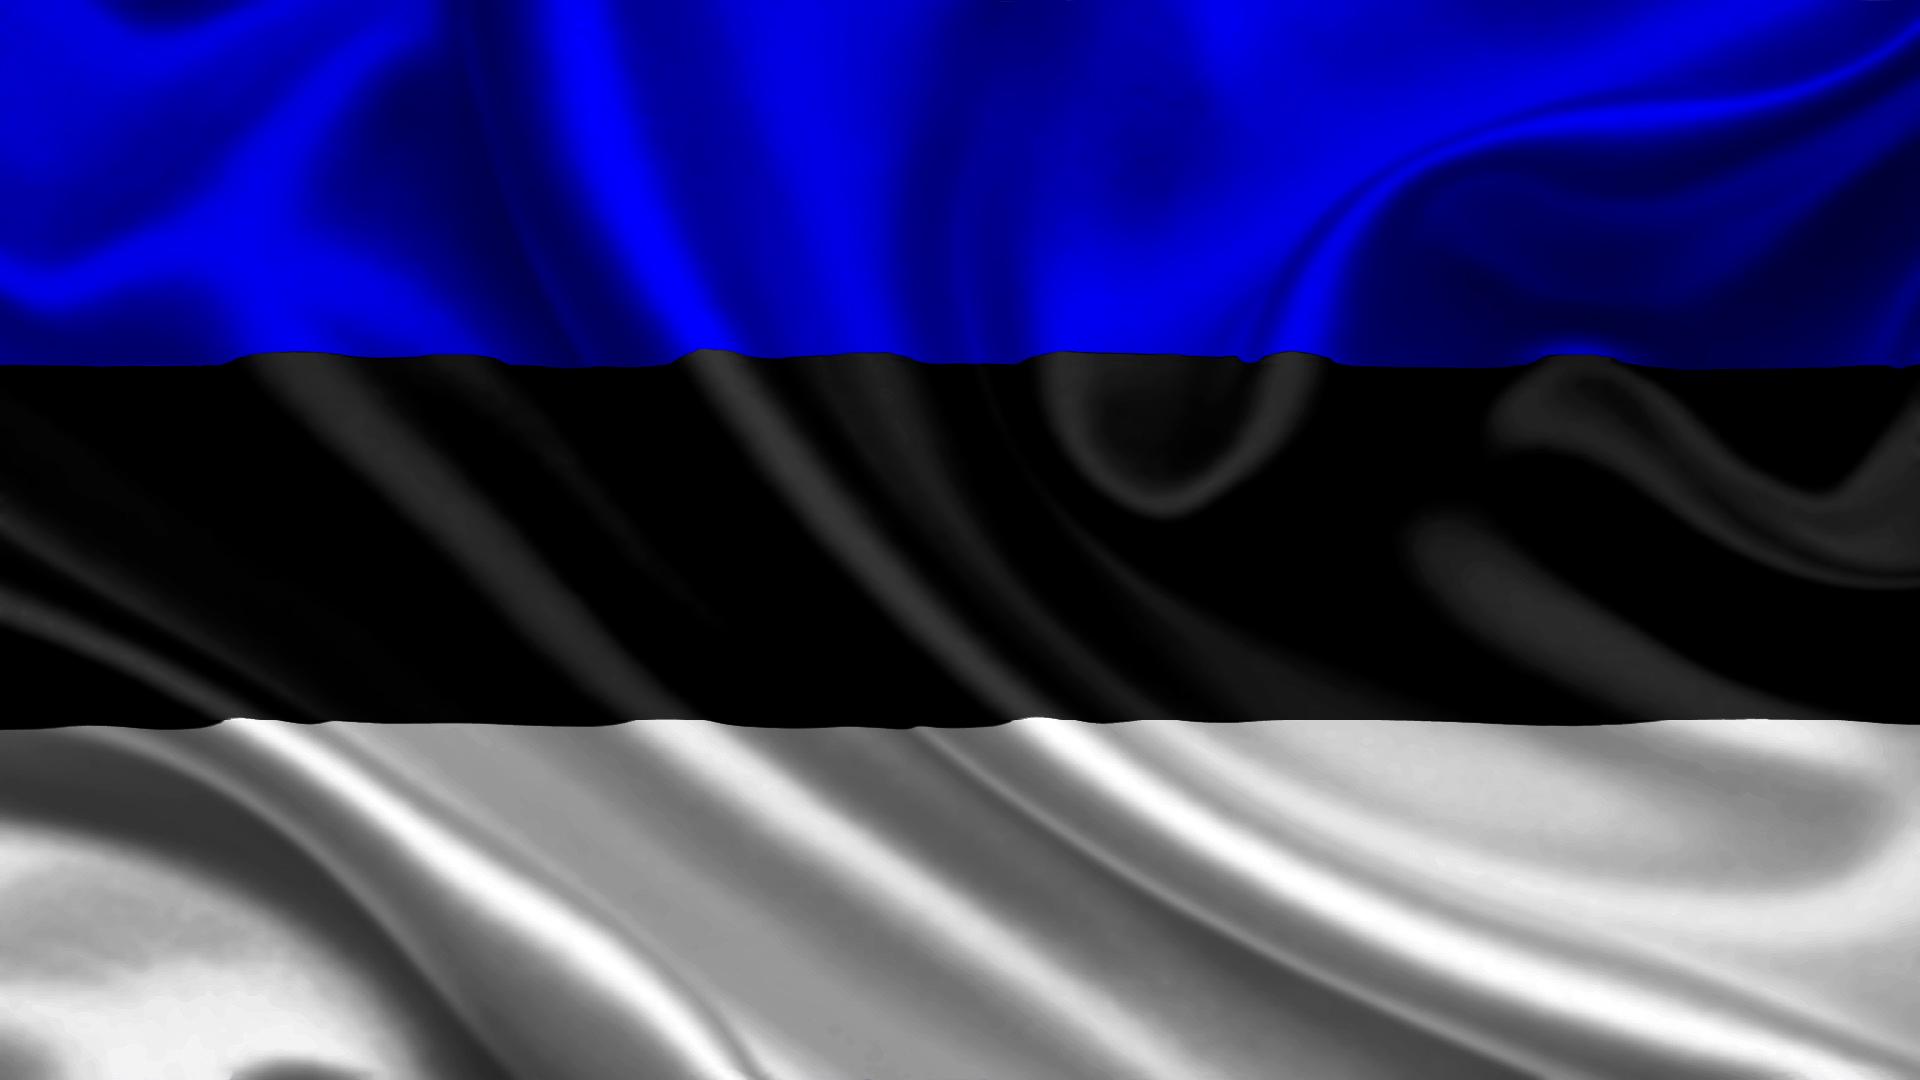 Images Estonia Flag Stripes 1920x1080 1920x1080